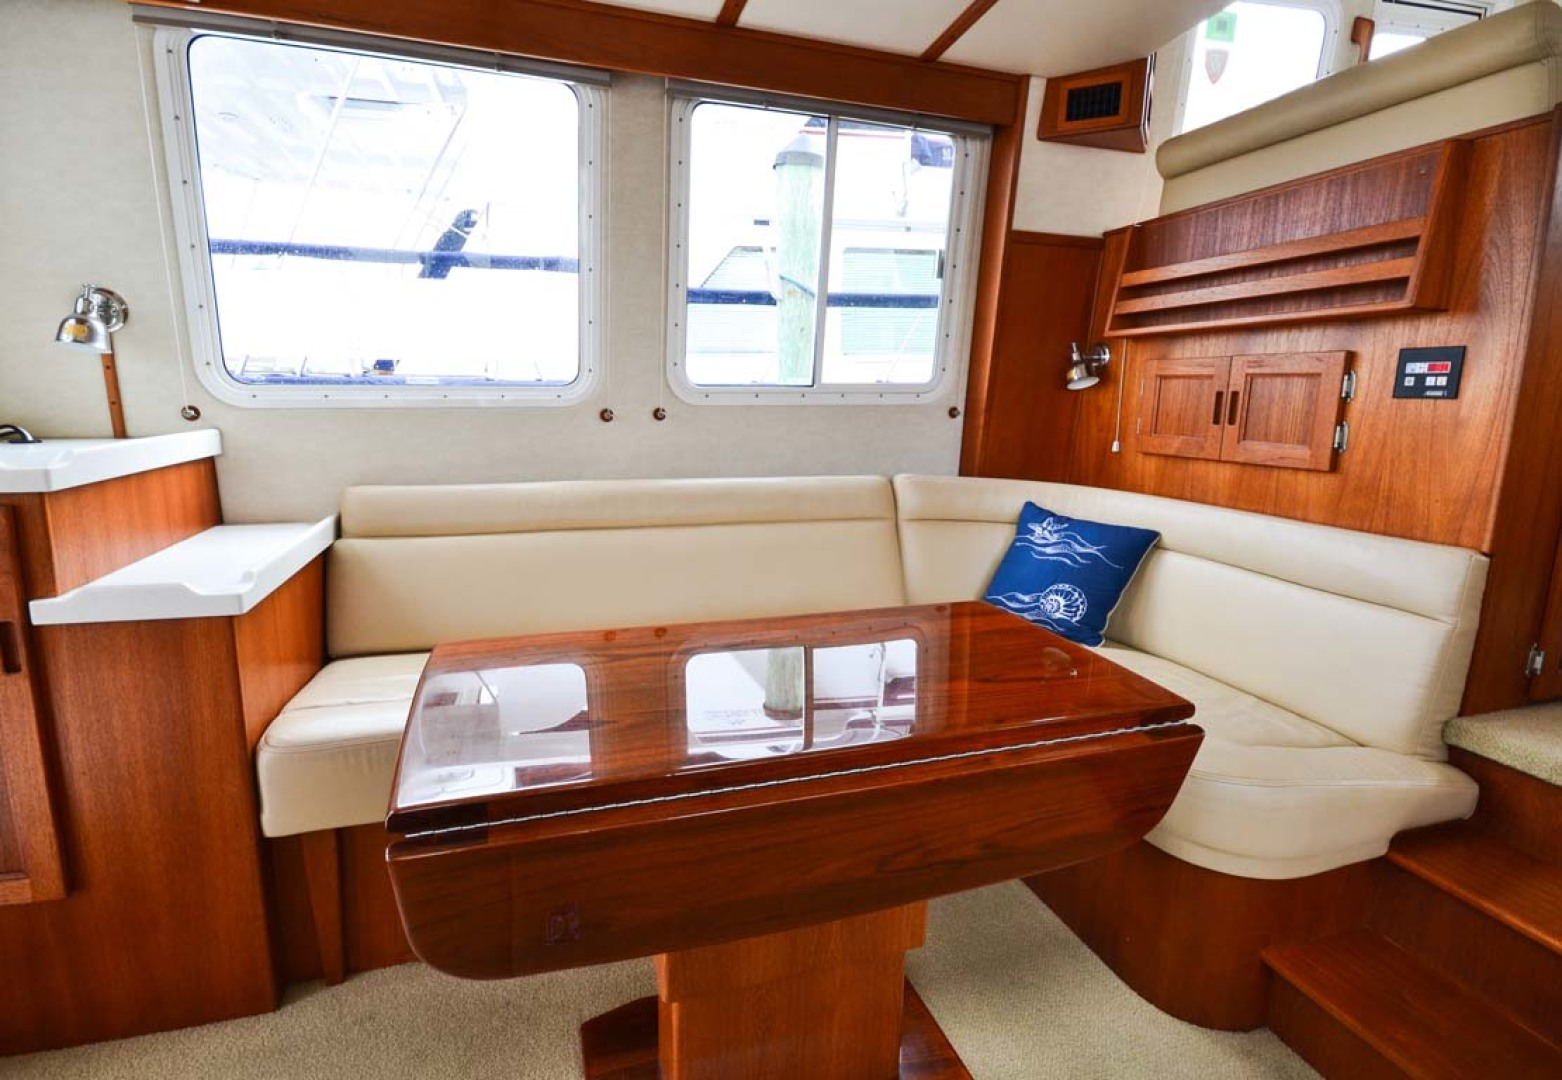 Nordic-Tugs-Flybridge-2005--Cocoa-Florida-United-States-Seating-Area-1085920